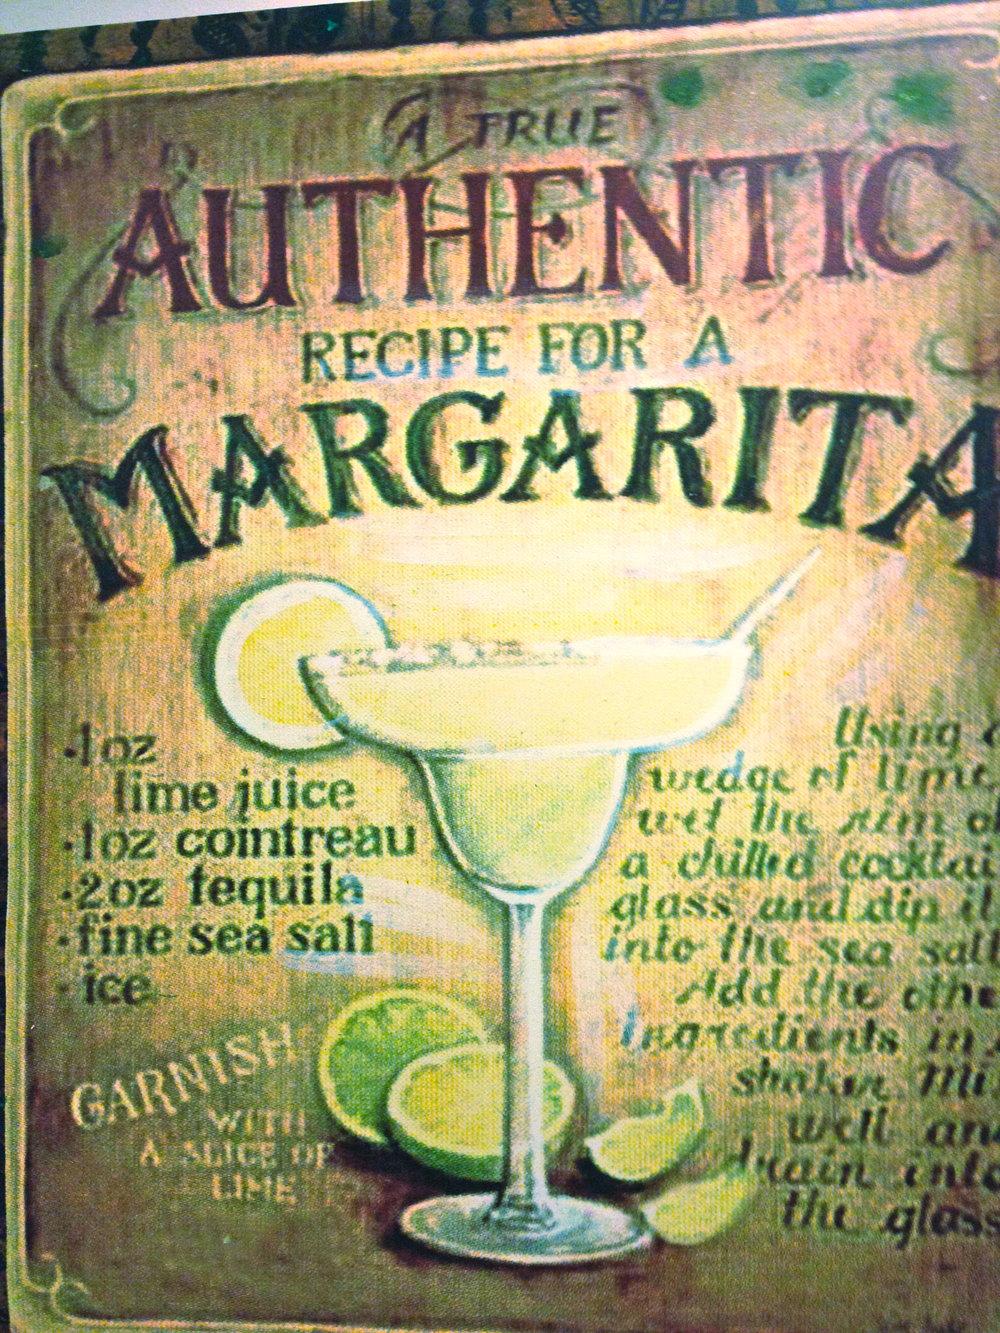 Casa Coco Margarita Recipe Sign